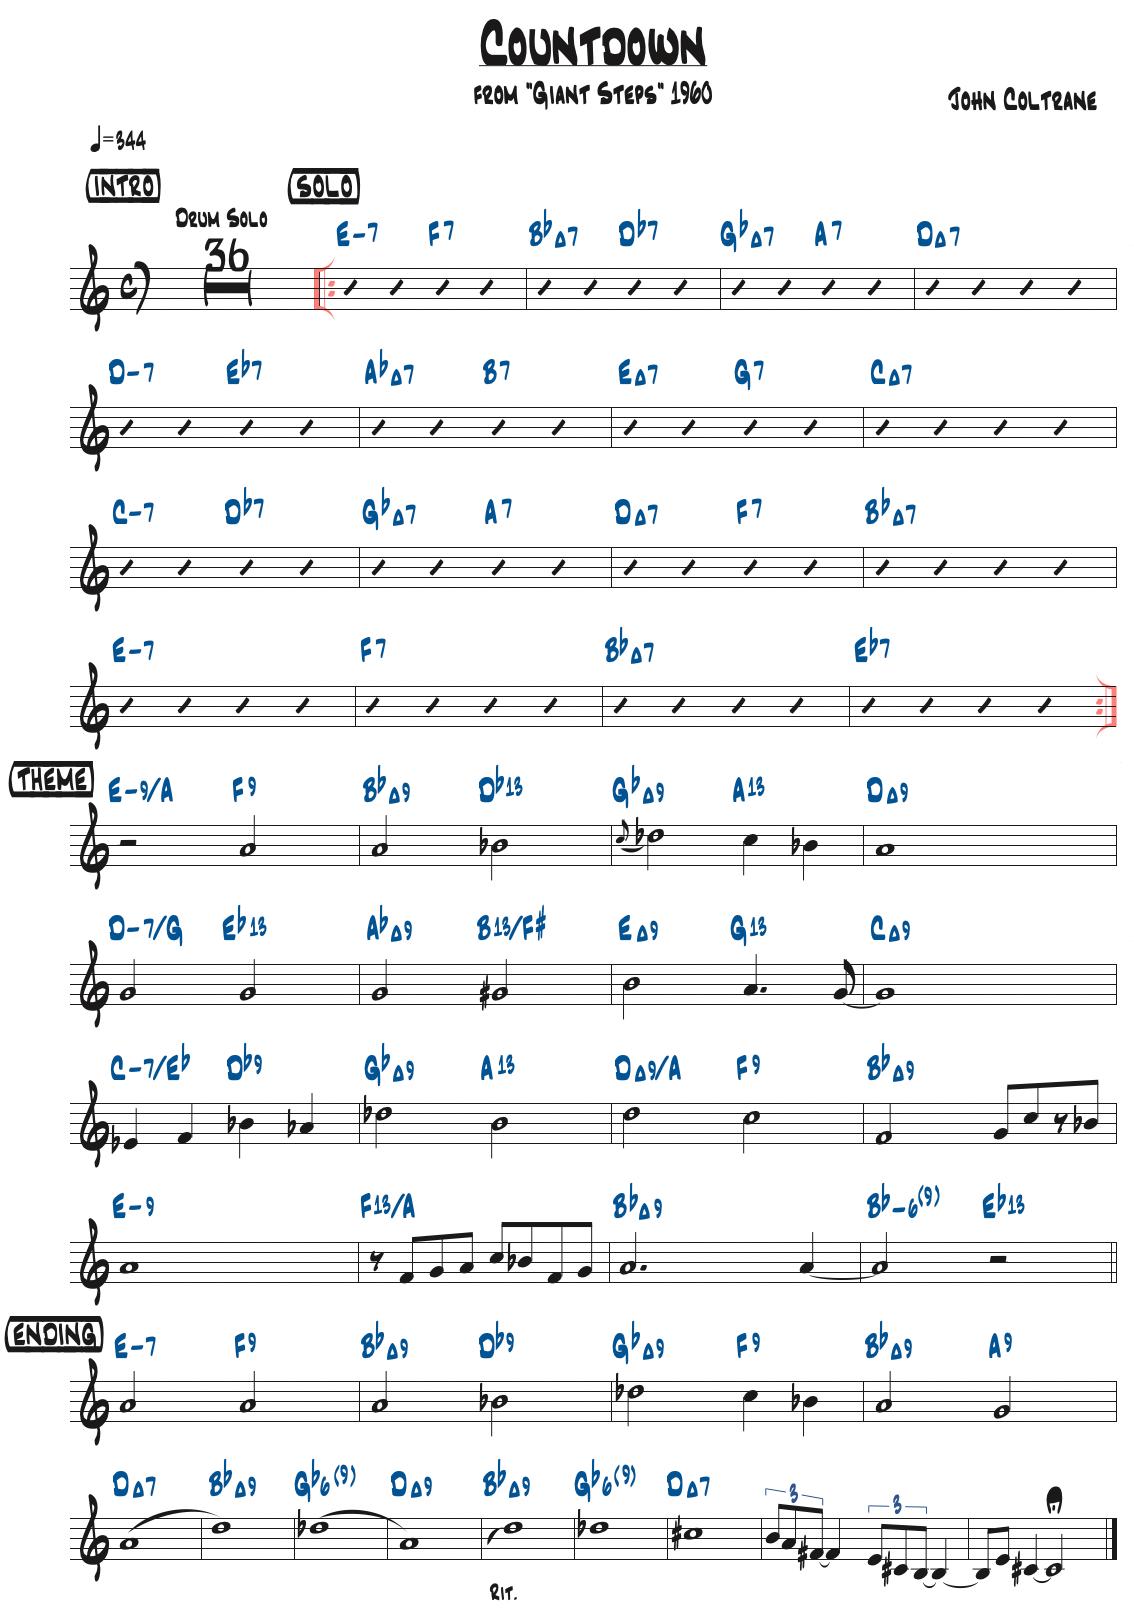 John Coltrane作曲『Countdown』のリードシート